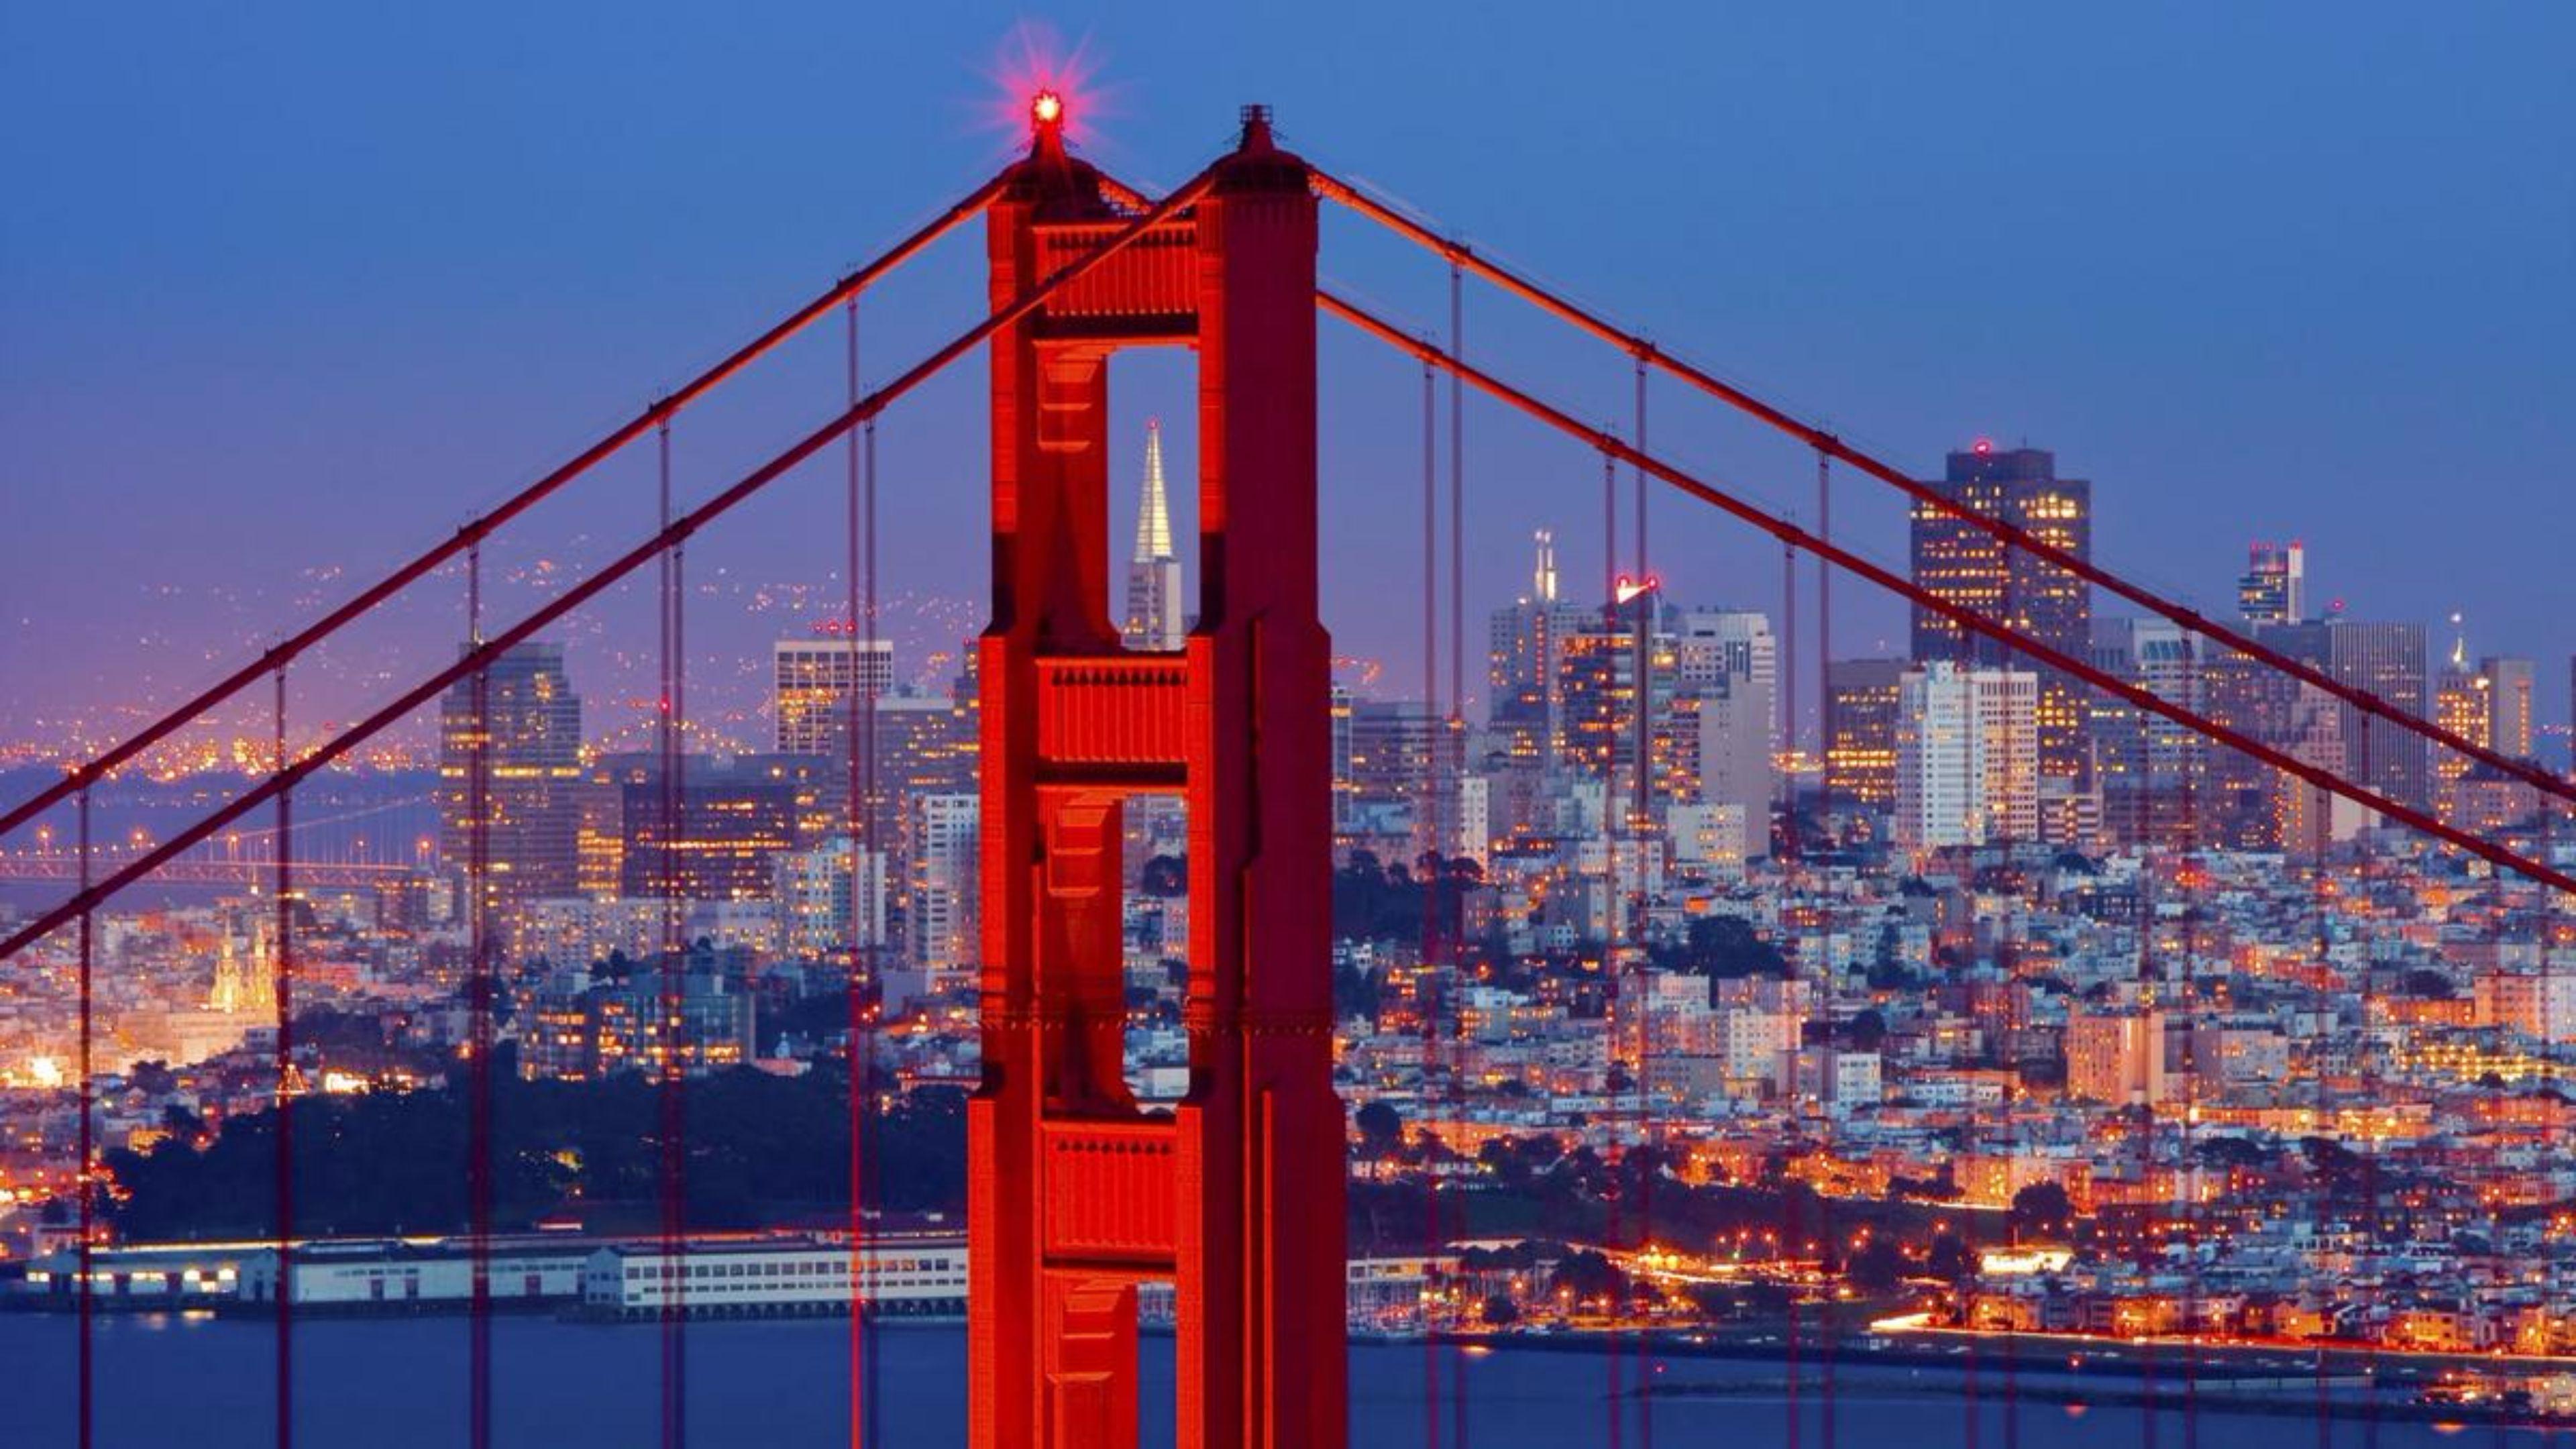 San Francisco 4k Wallpapers Top Free San Francisco 4k